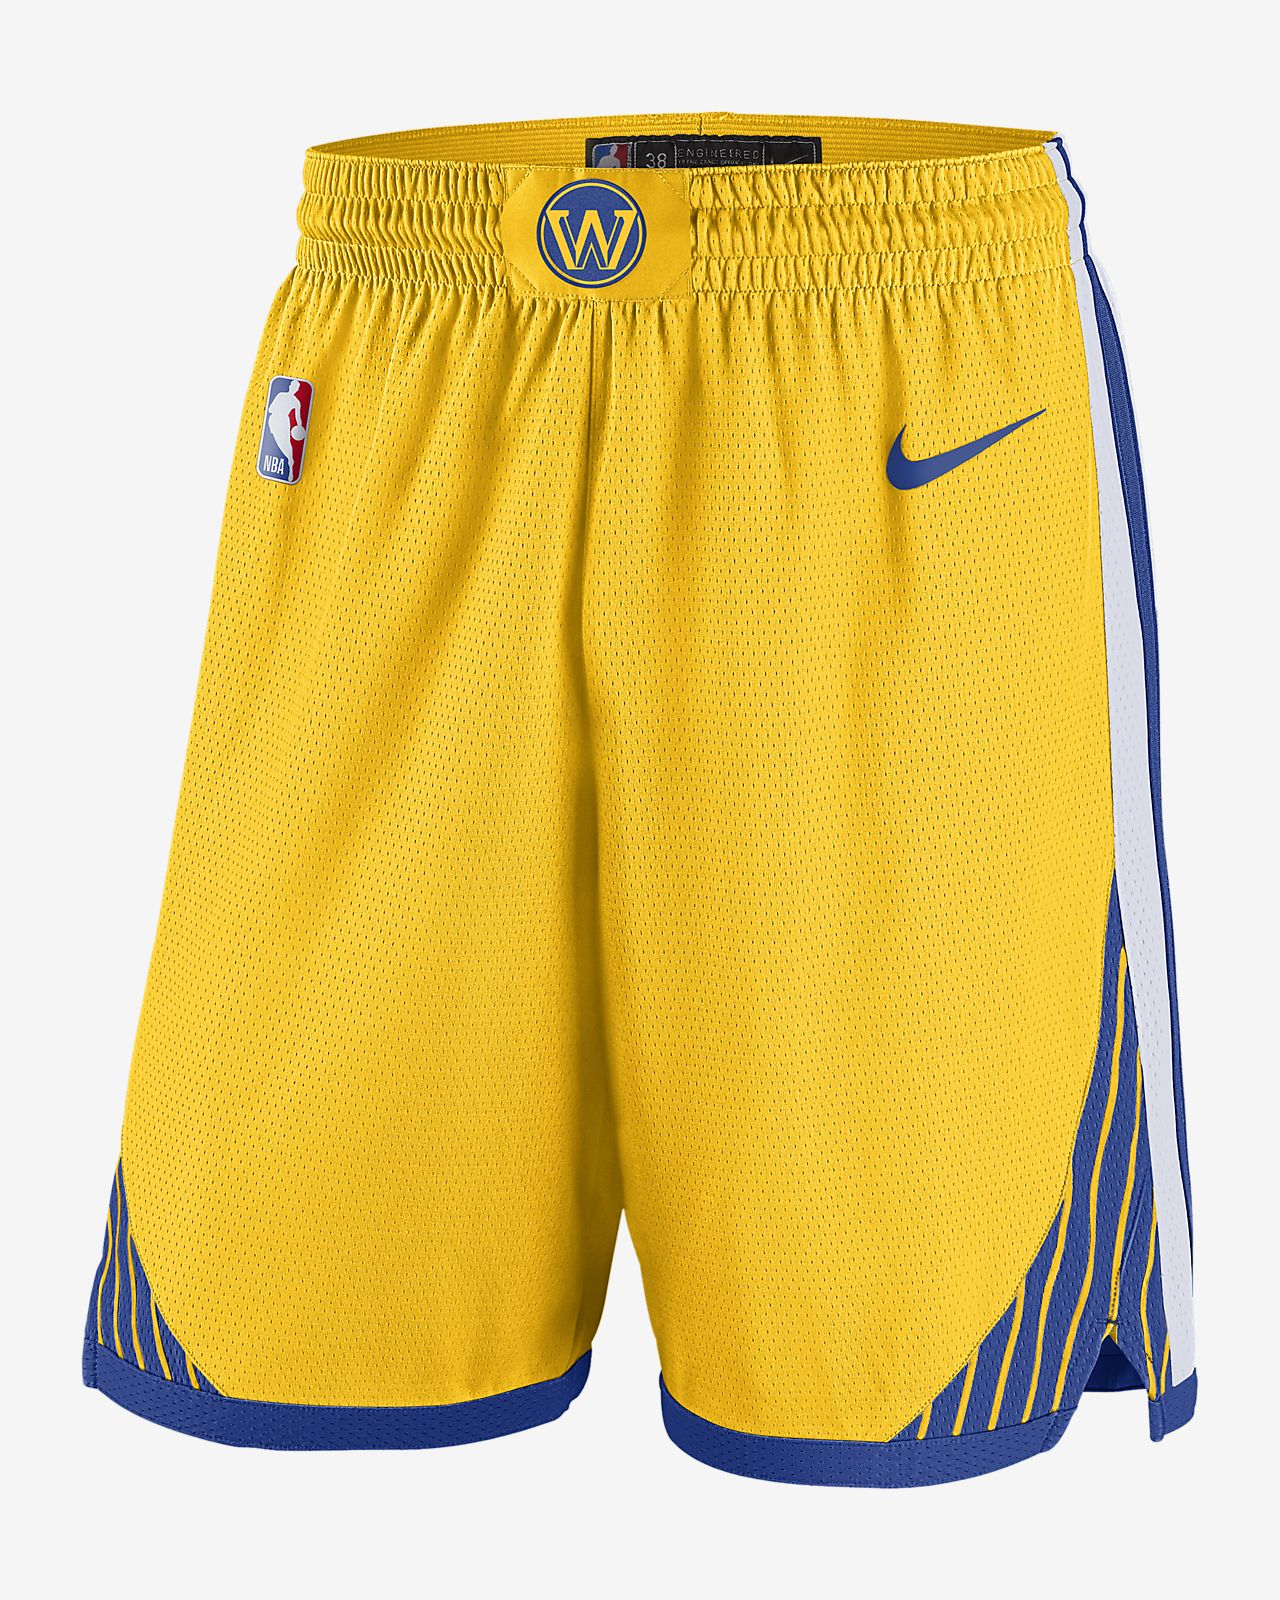 Shorts Golden State Warriors Statement Edition Swingman Nike NBA - Uomo